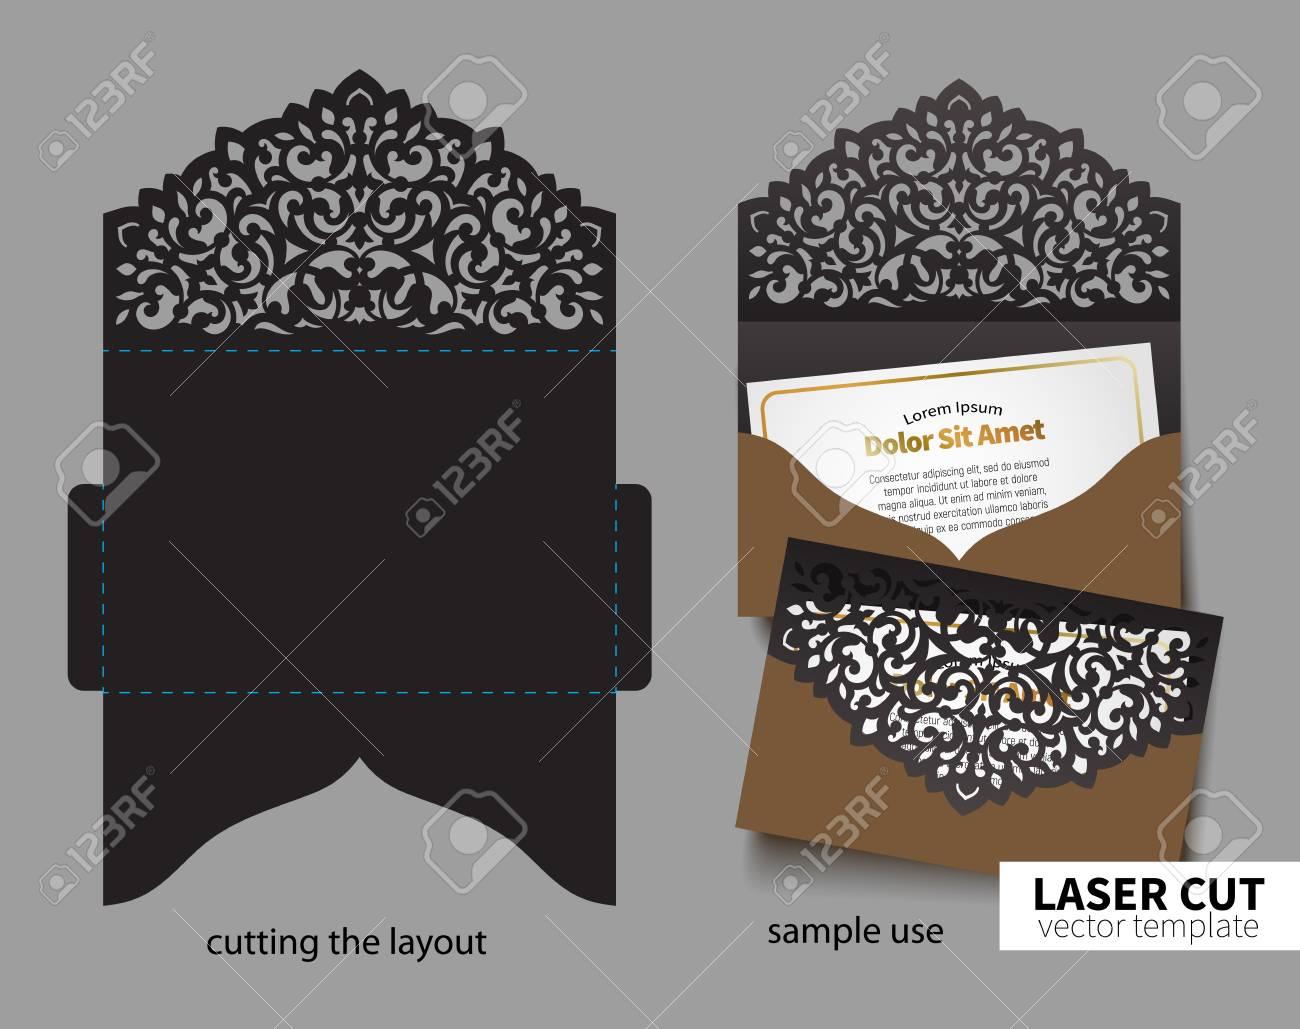 digital vector file for laser cutting swirly ornate wedding